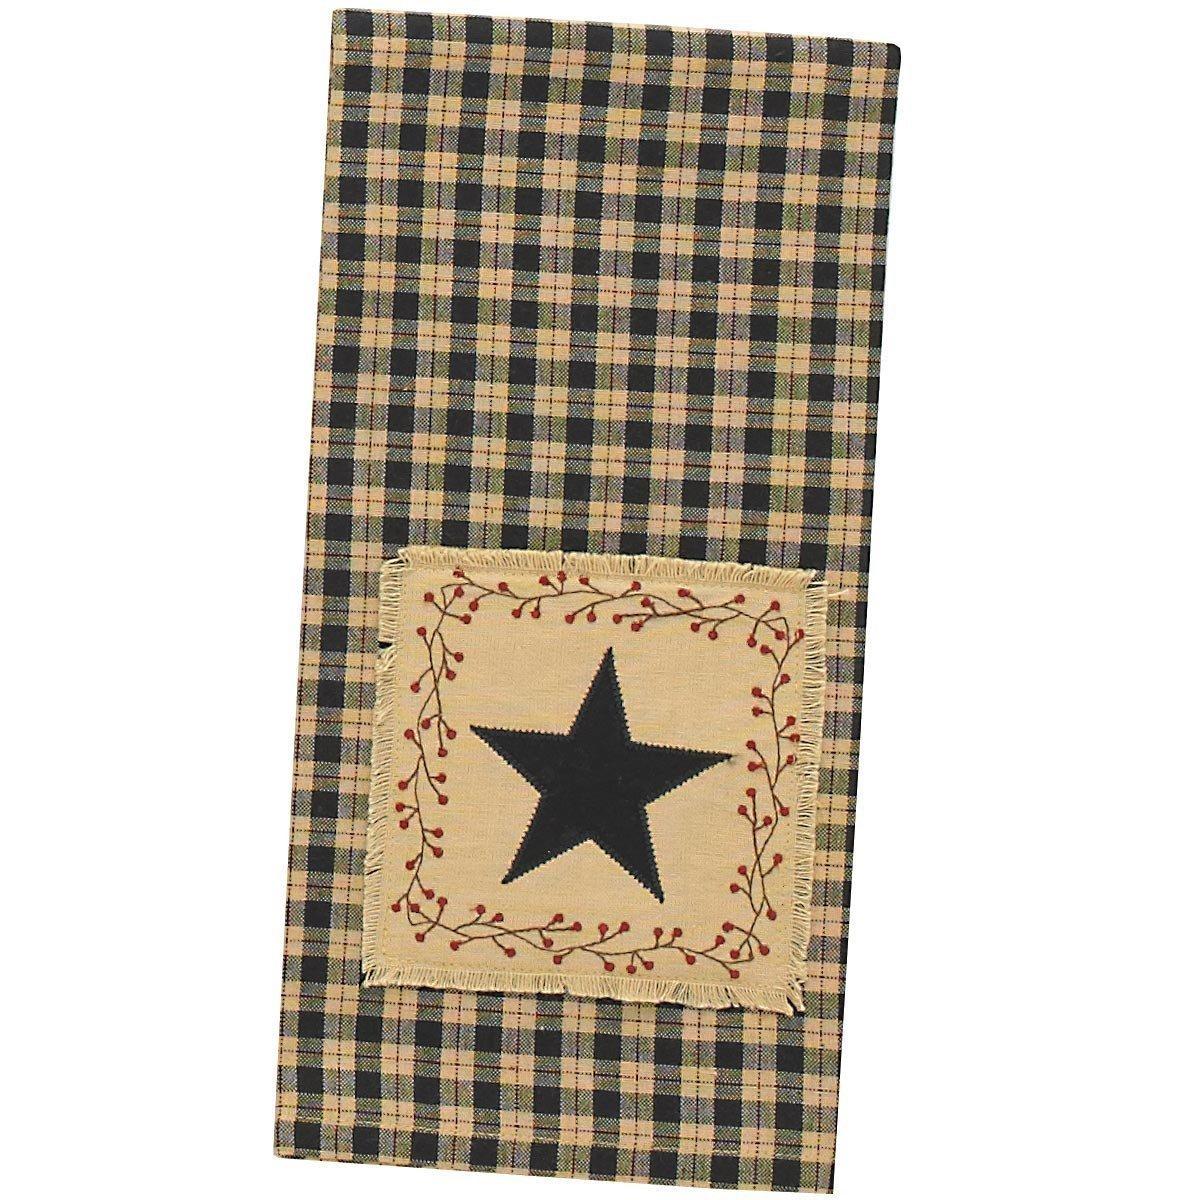 Star Patch Decorative Dish Towel